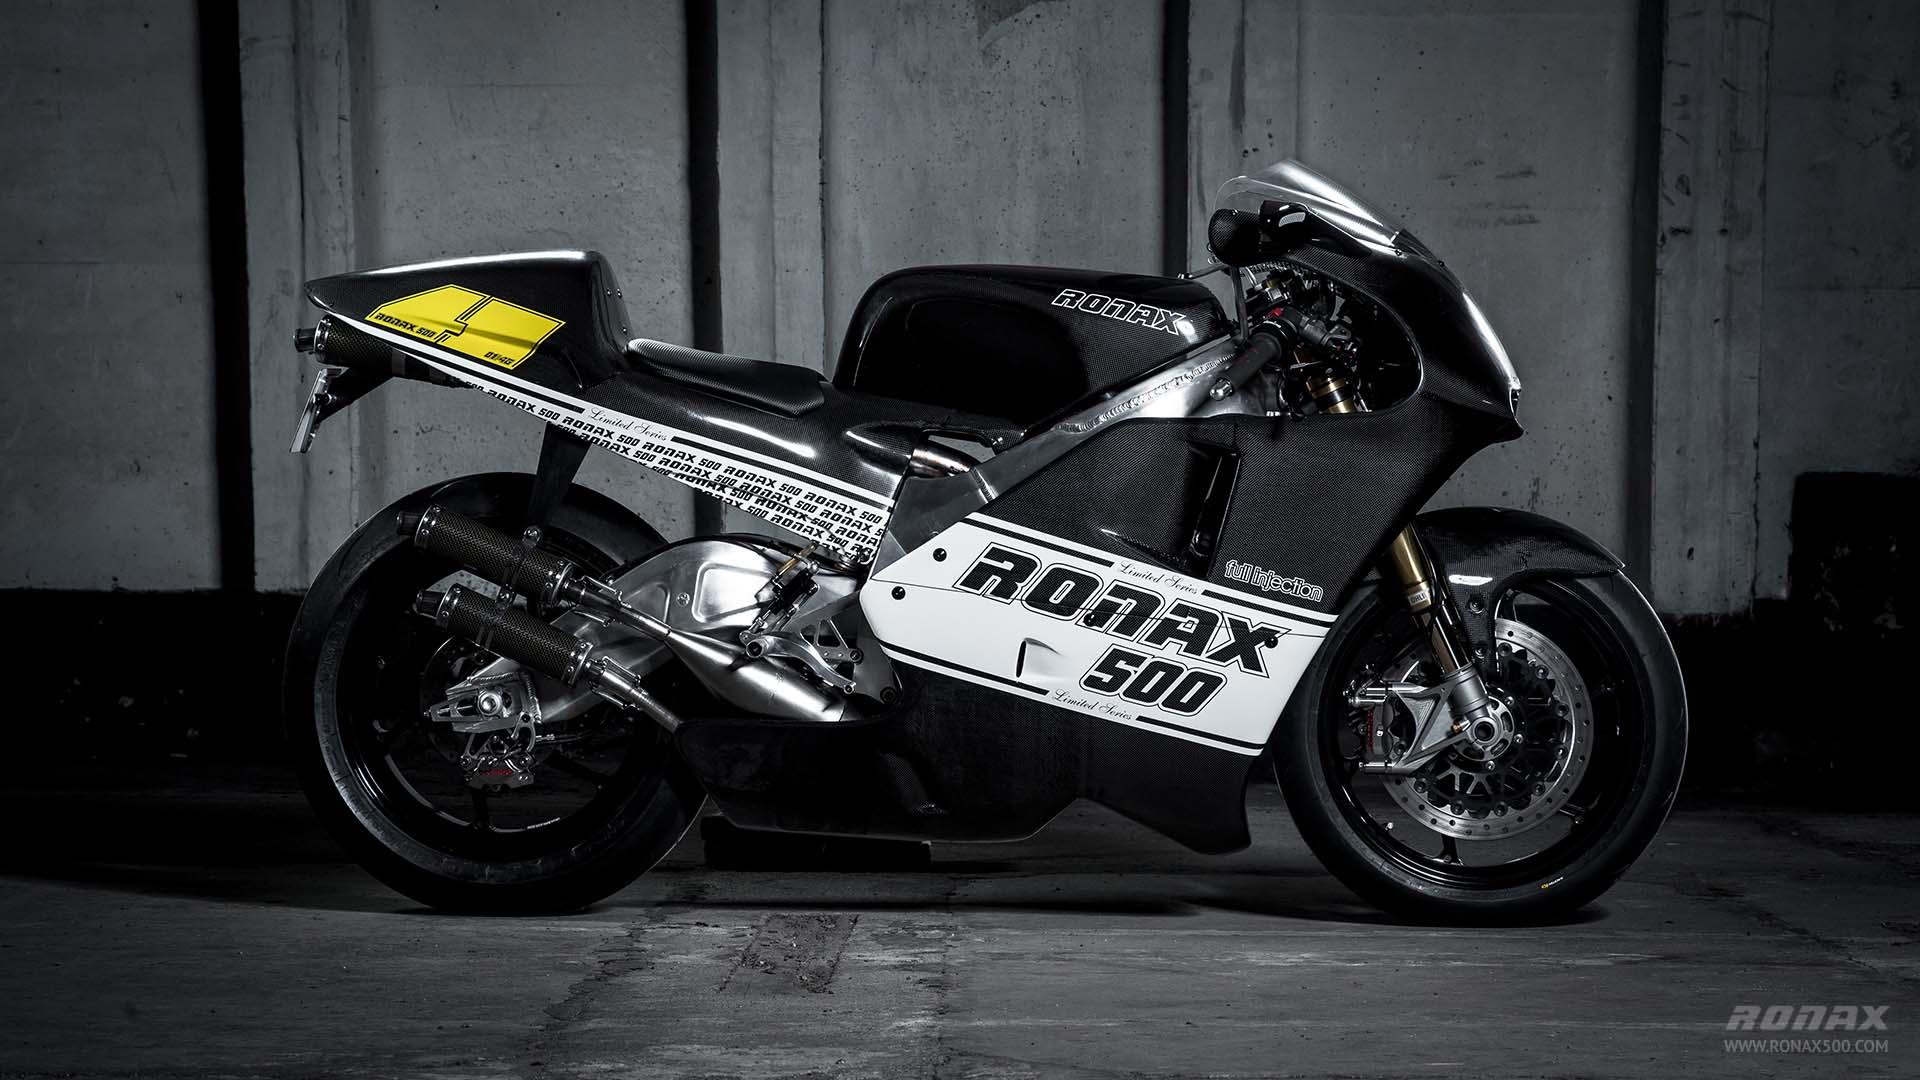 Ronax 500 your modern 500cc two stroke track bike for Yamaha 500cc sport bikes